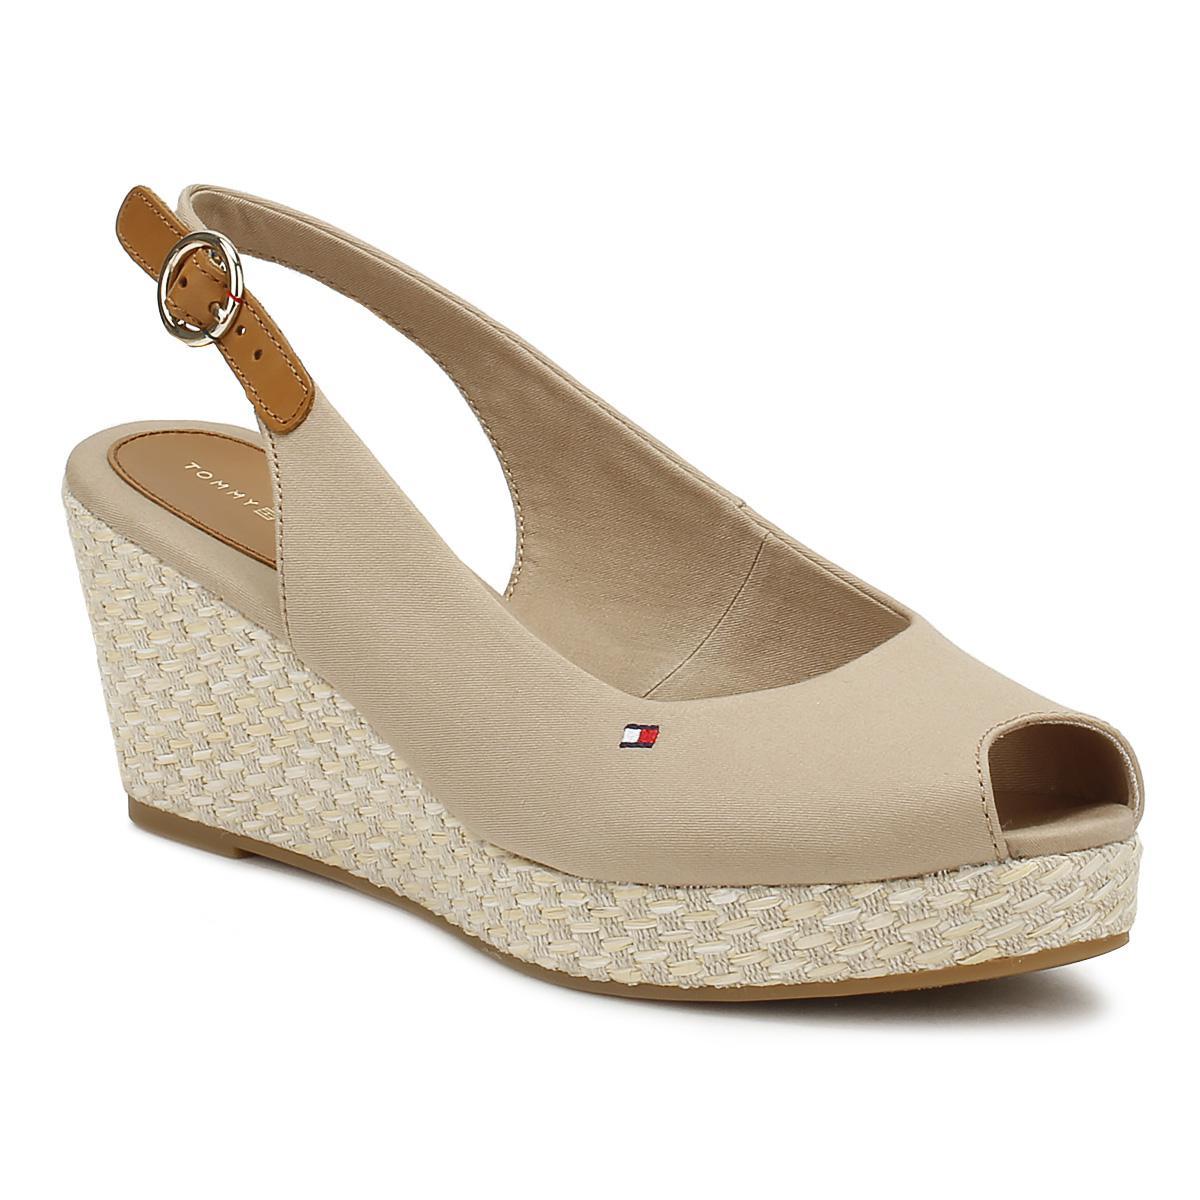 0ff160de4be Tommy Hilfiger Womens Cobblestone Grey Elba Wedge Sandals - Lyst